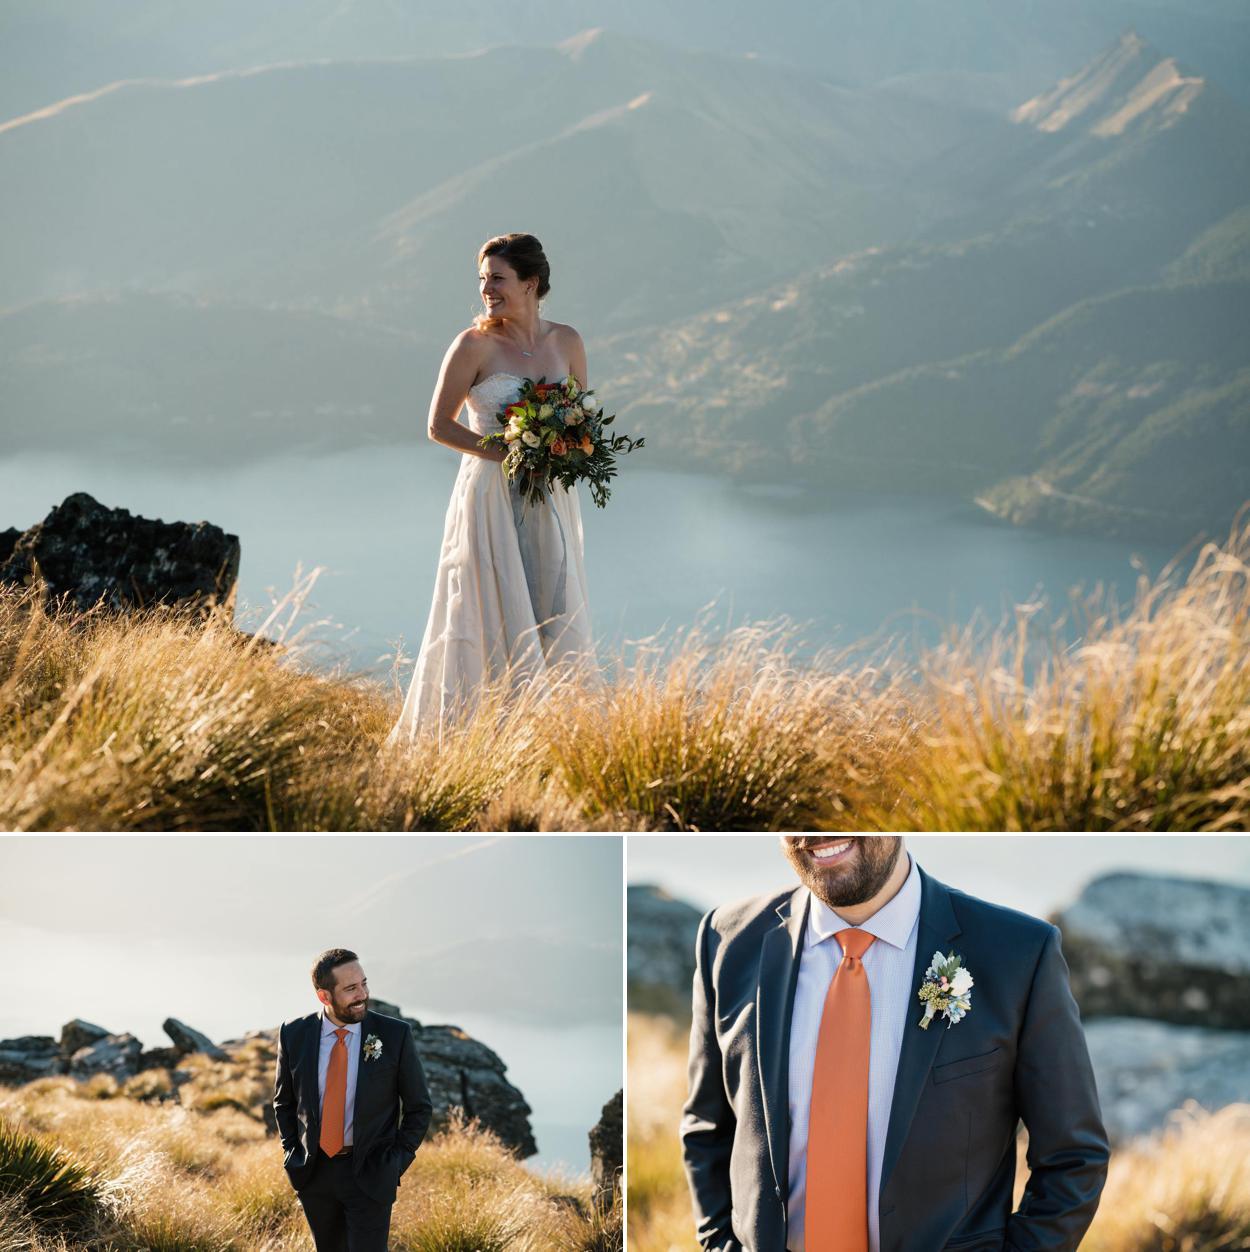 sunset heli wedding video vy Sunshine Weddings